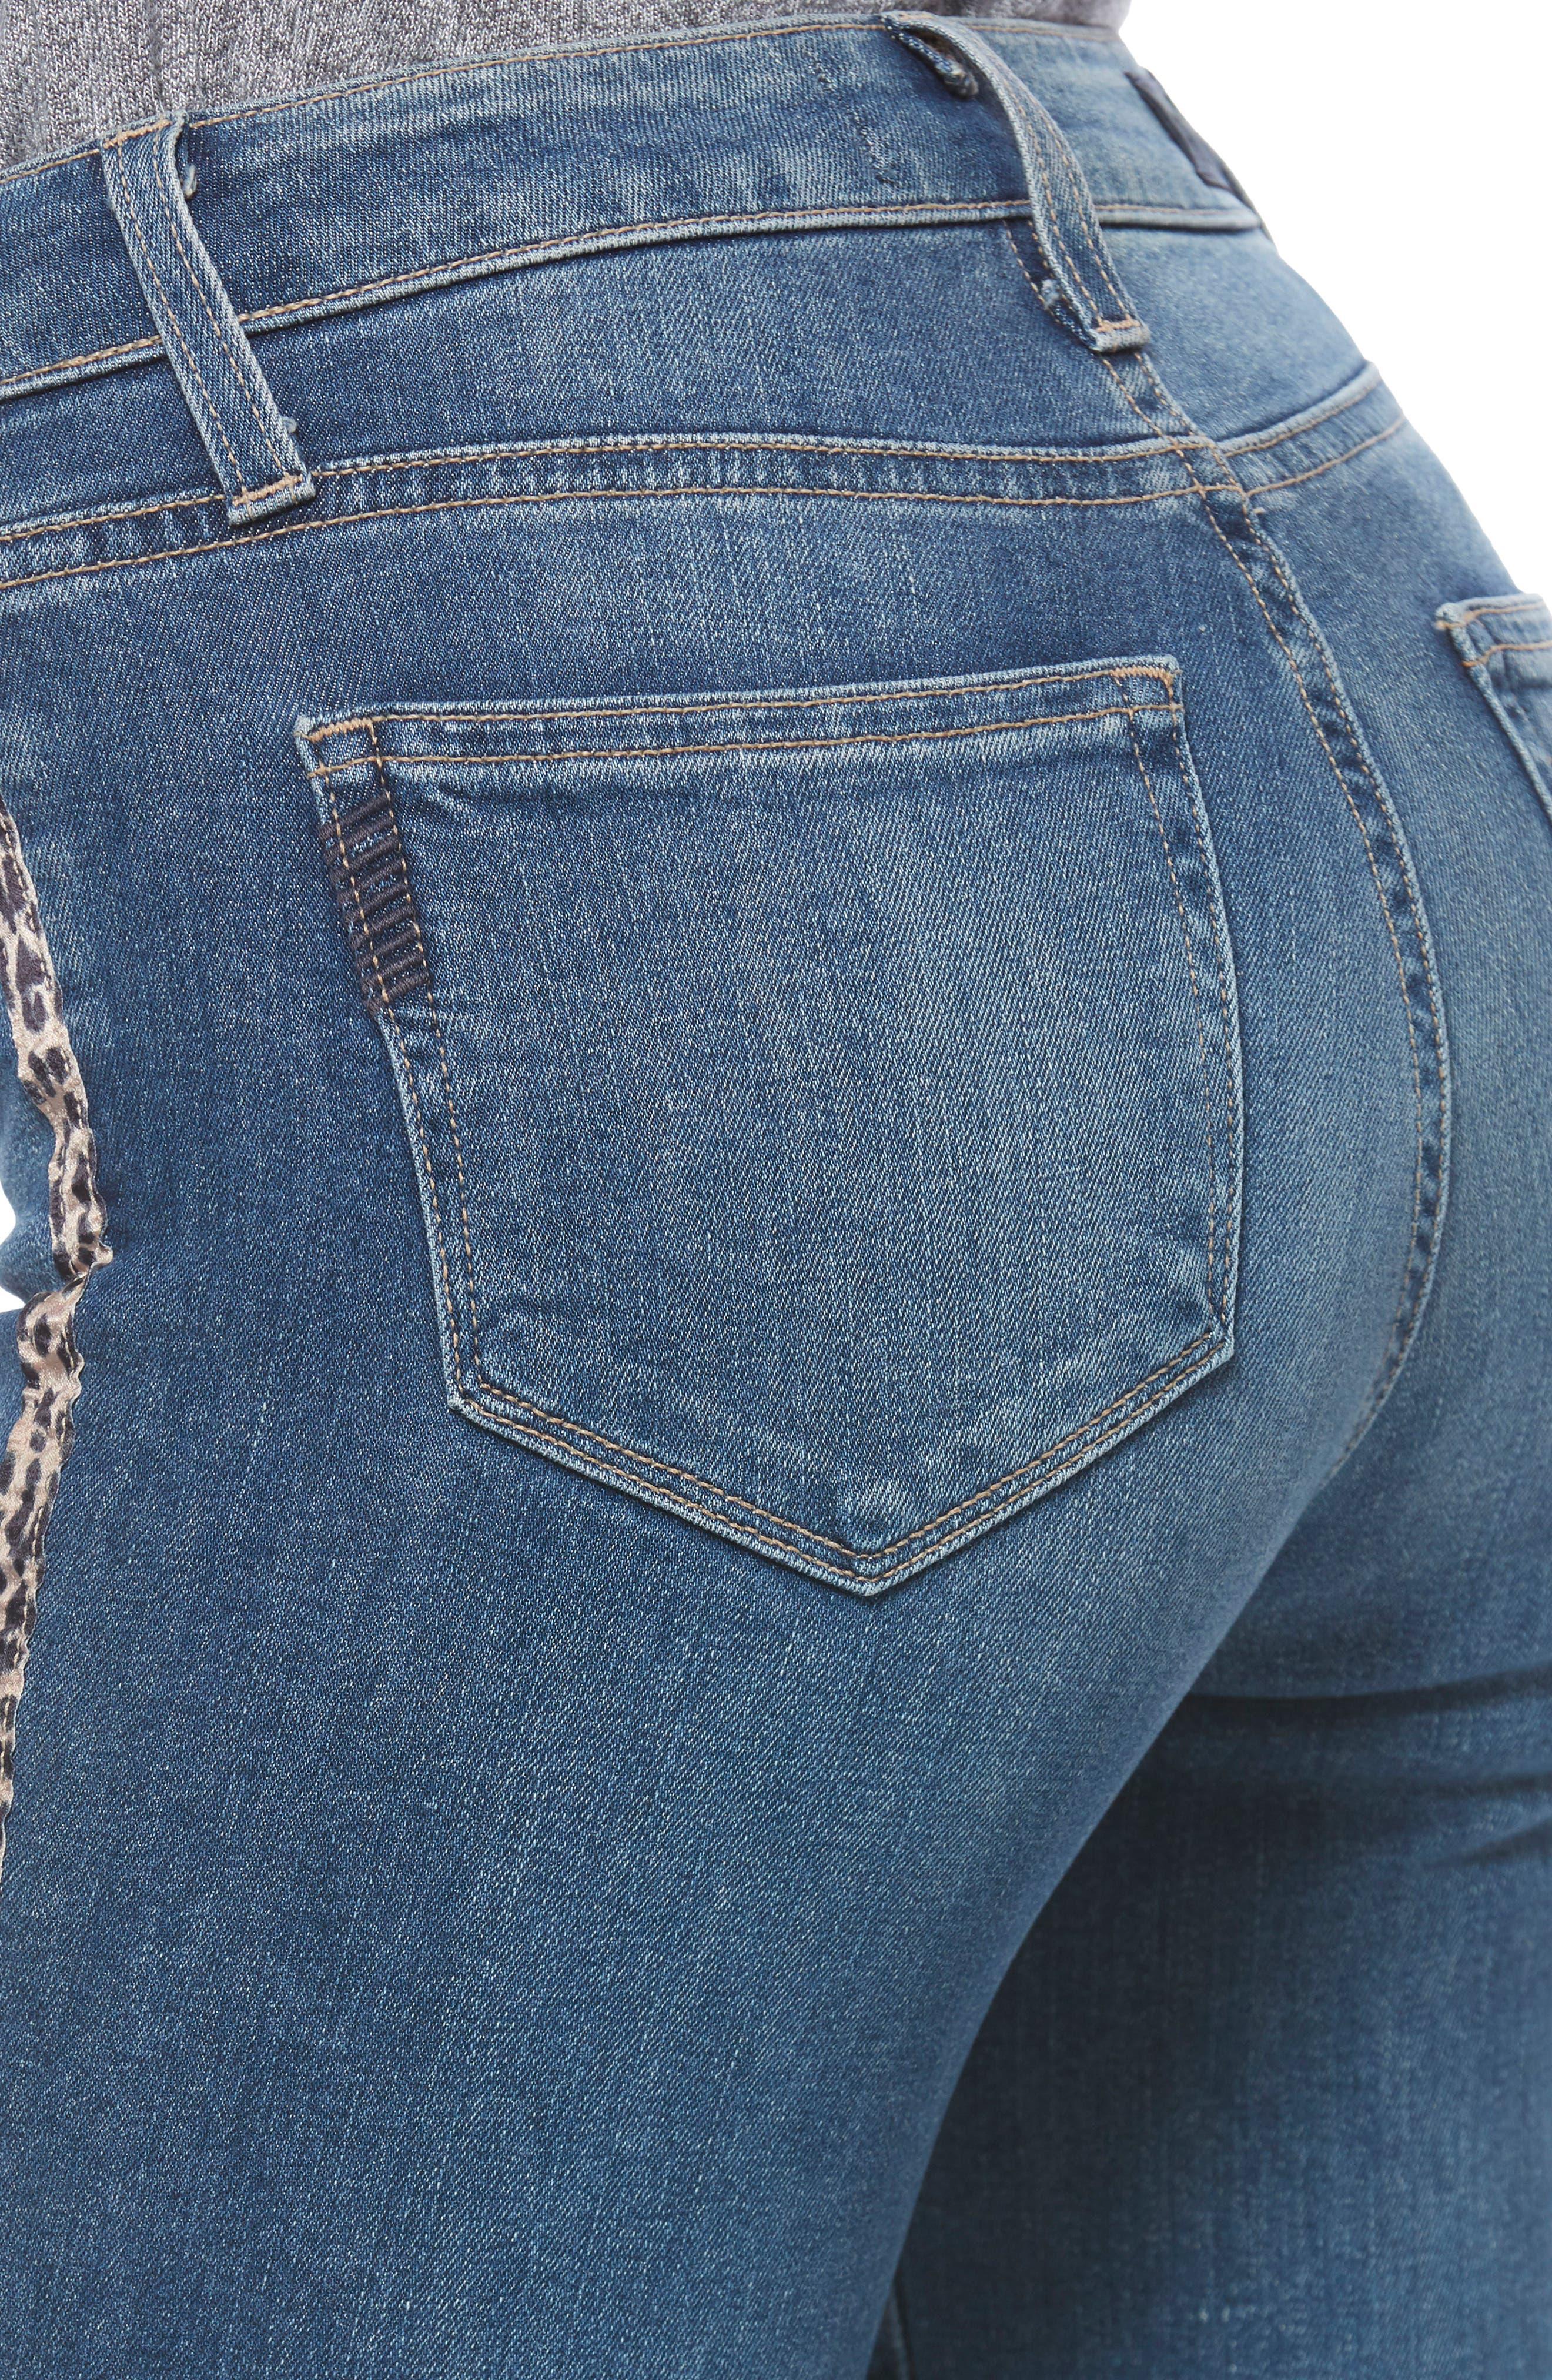 PAIGE, Hoxton High Waist Raw Hem Crop Skinny Jeans, Alternate thumbnail 8, color, BARKLEY W/ LEOPARD